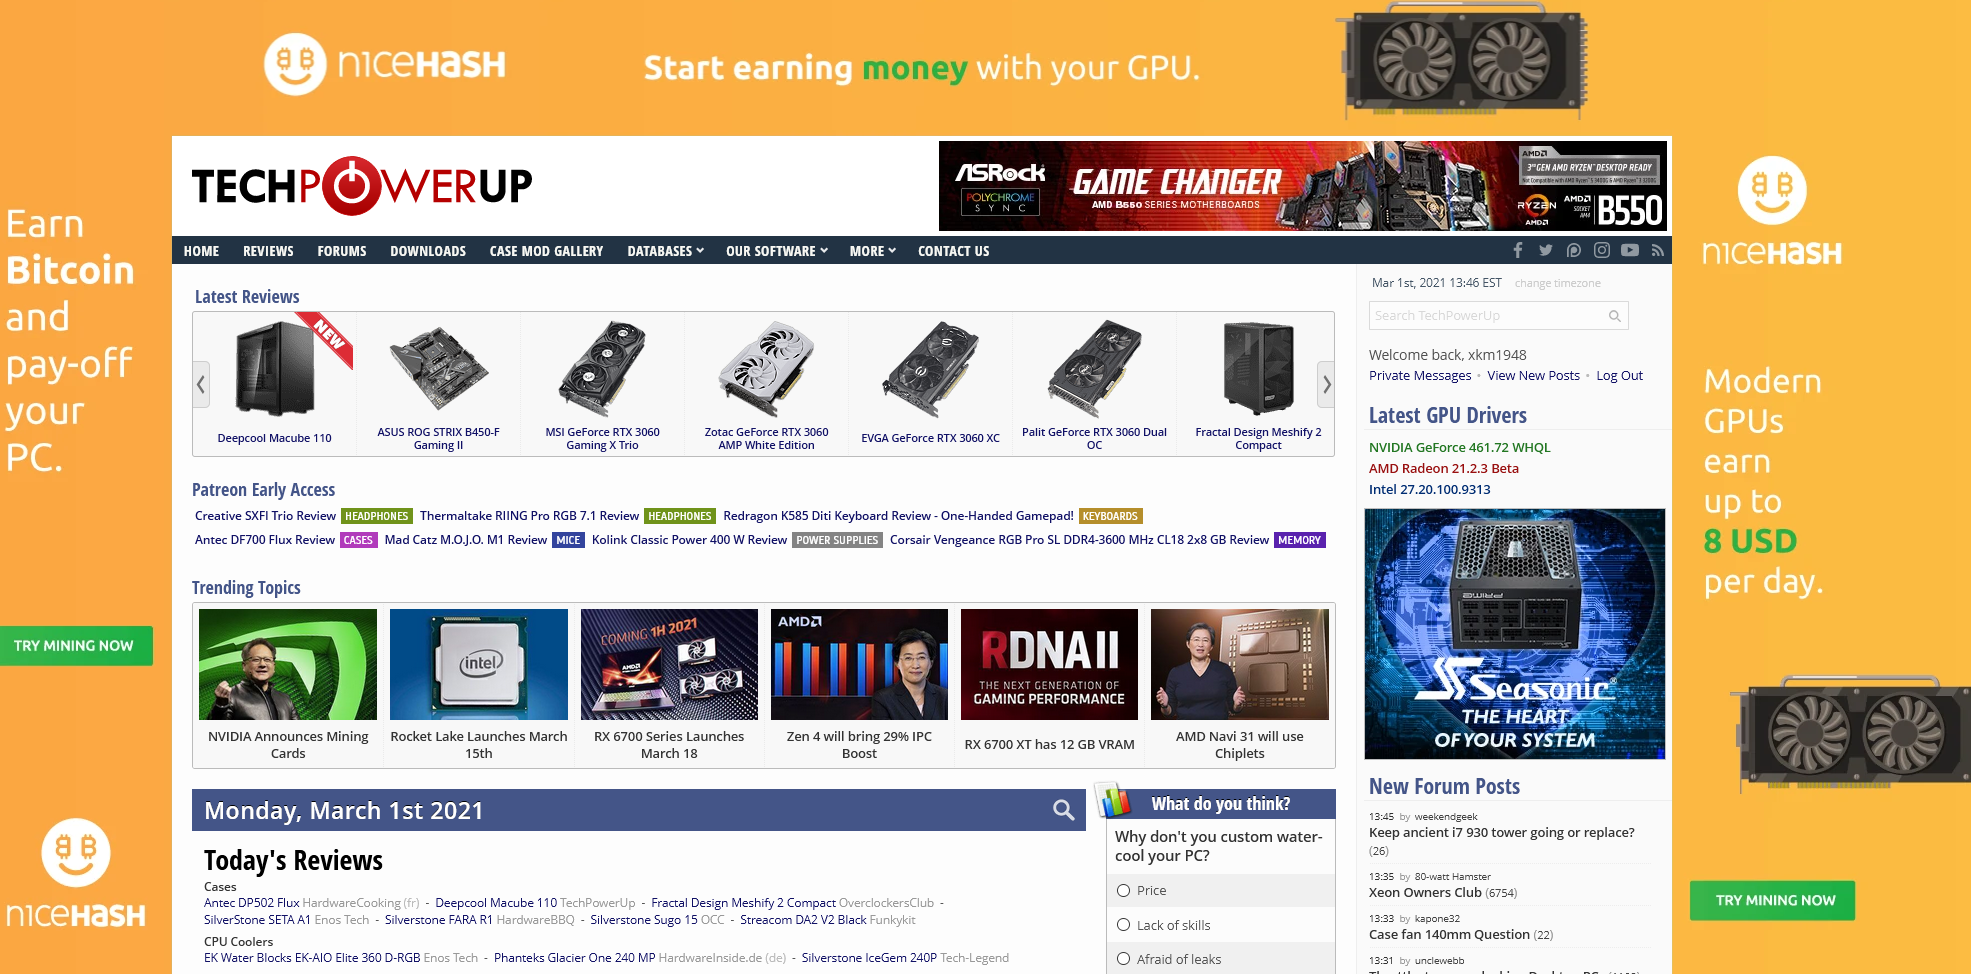 Screenshot 2021-03-01 134707.png